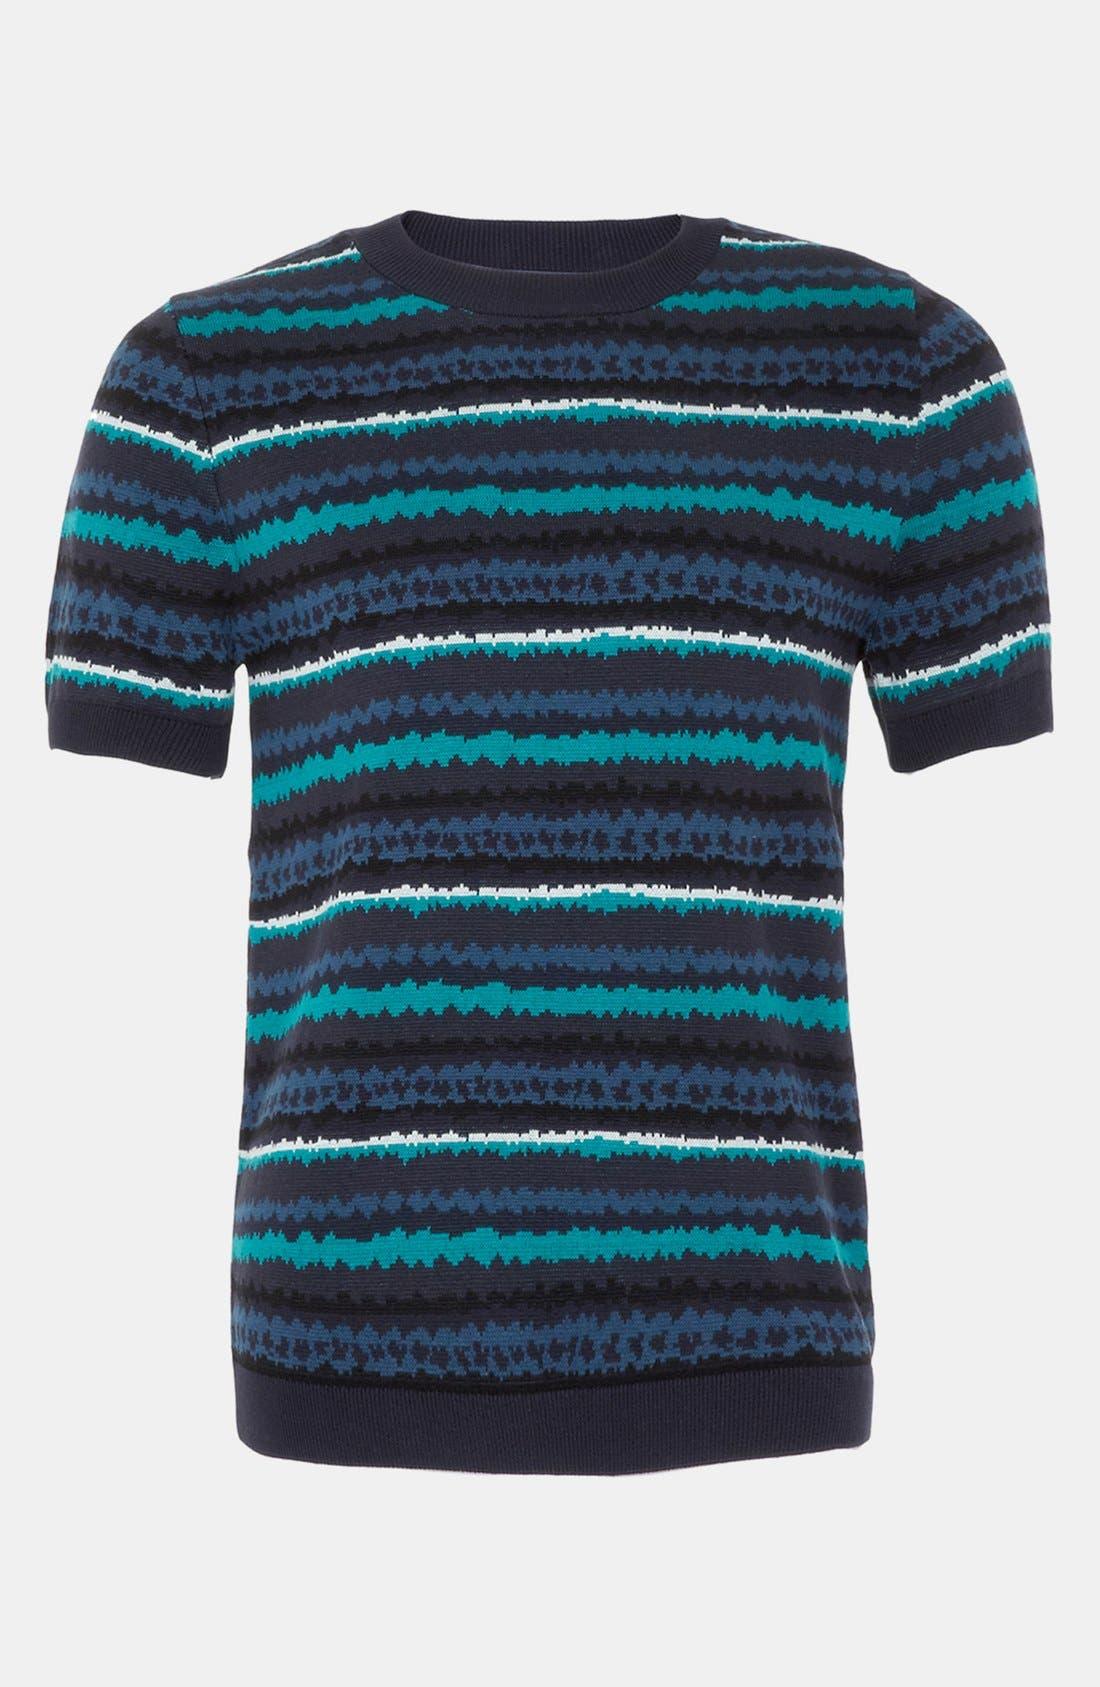 Alternate Image 1 Selected - Topman 'Static' Short Sleeve Sweater